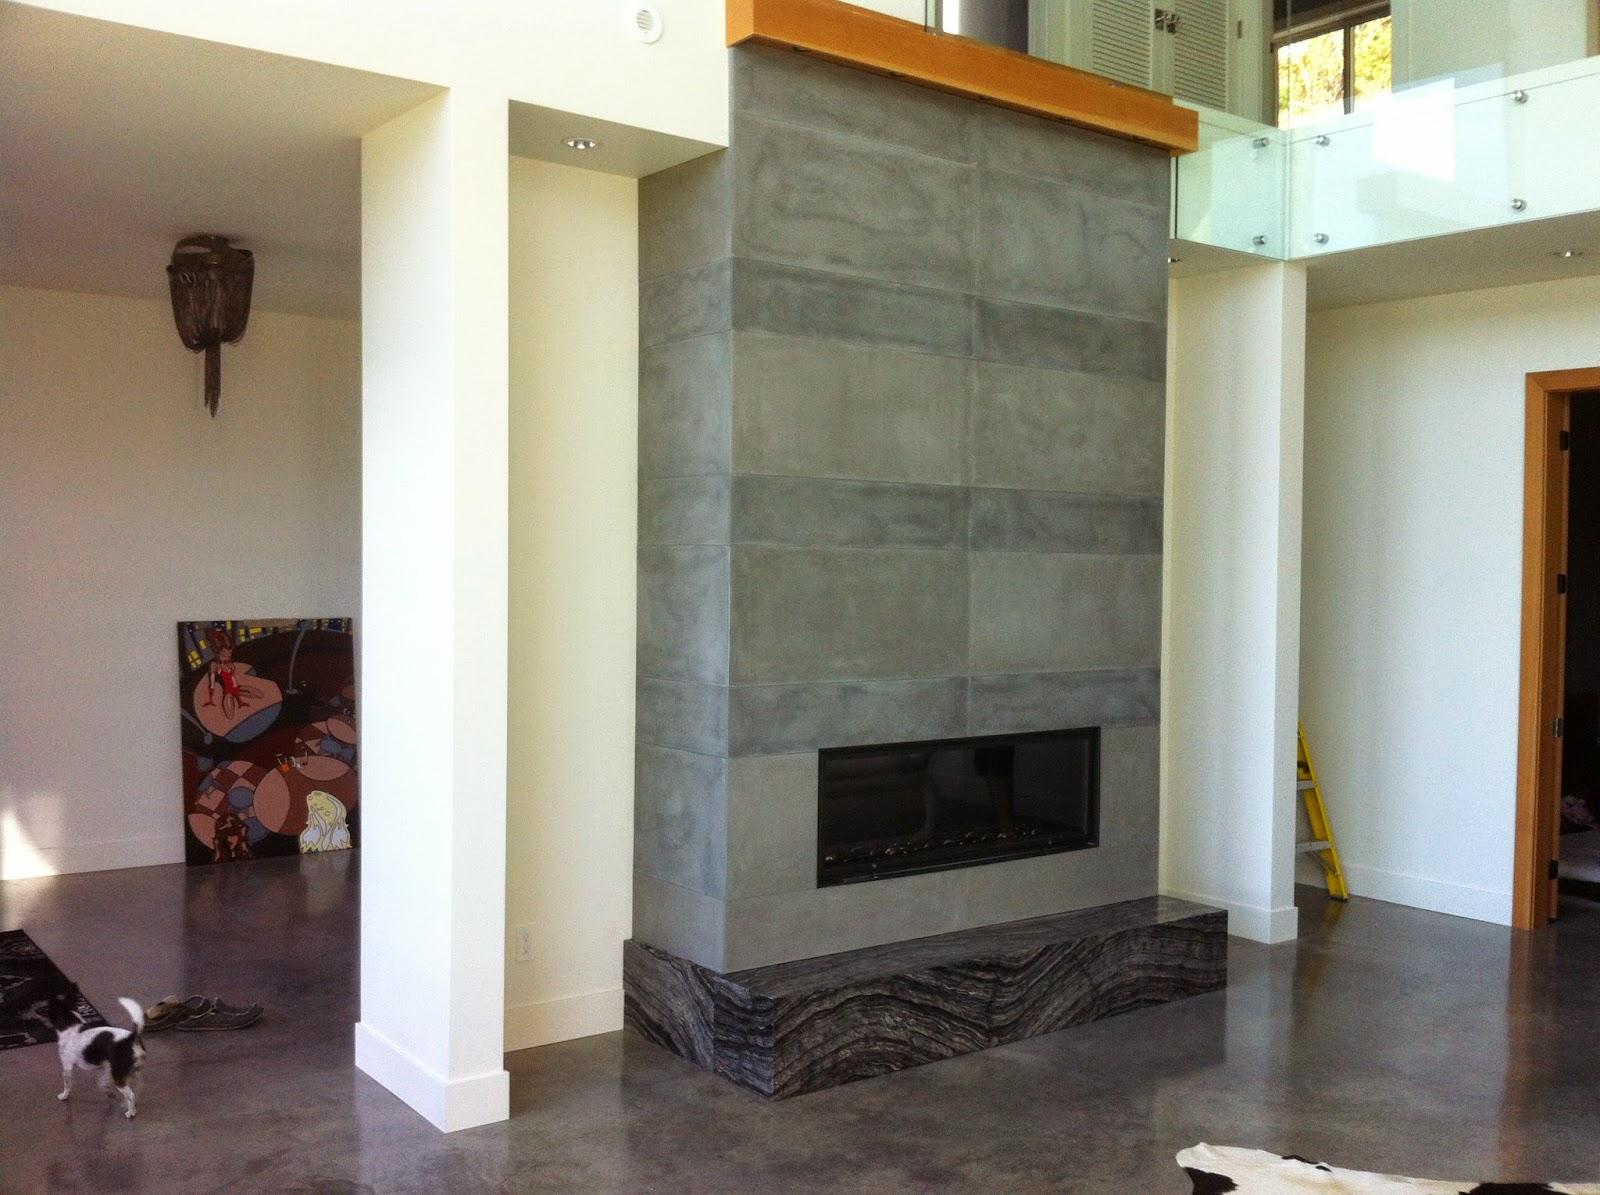 MODE CONCRETE: Contemporary Concrete Fireplace Tiles are ...